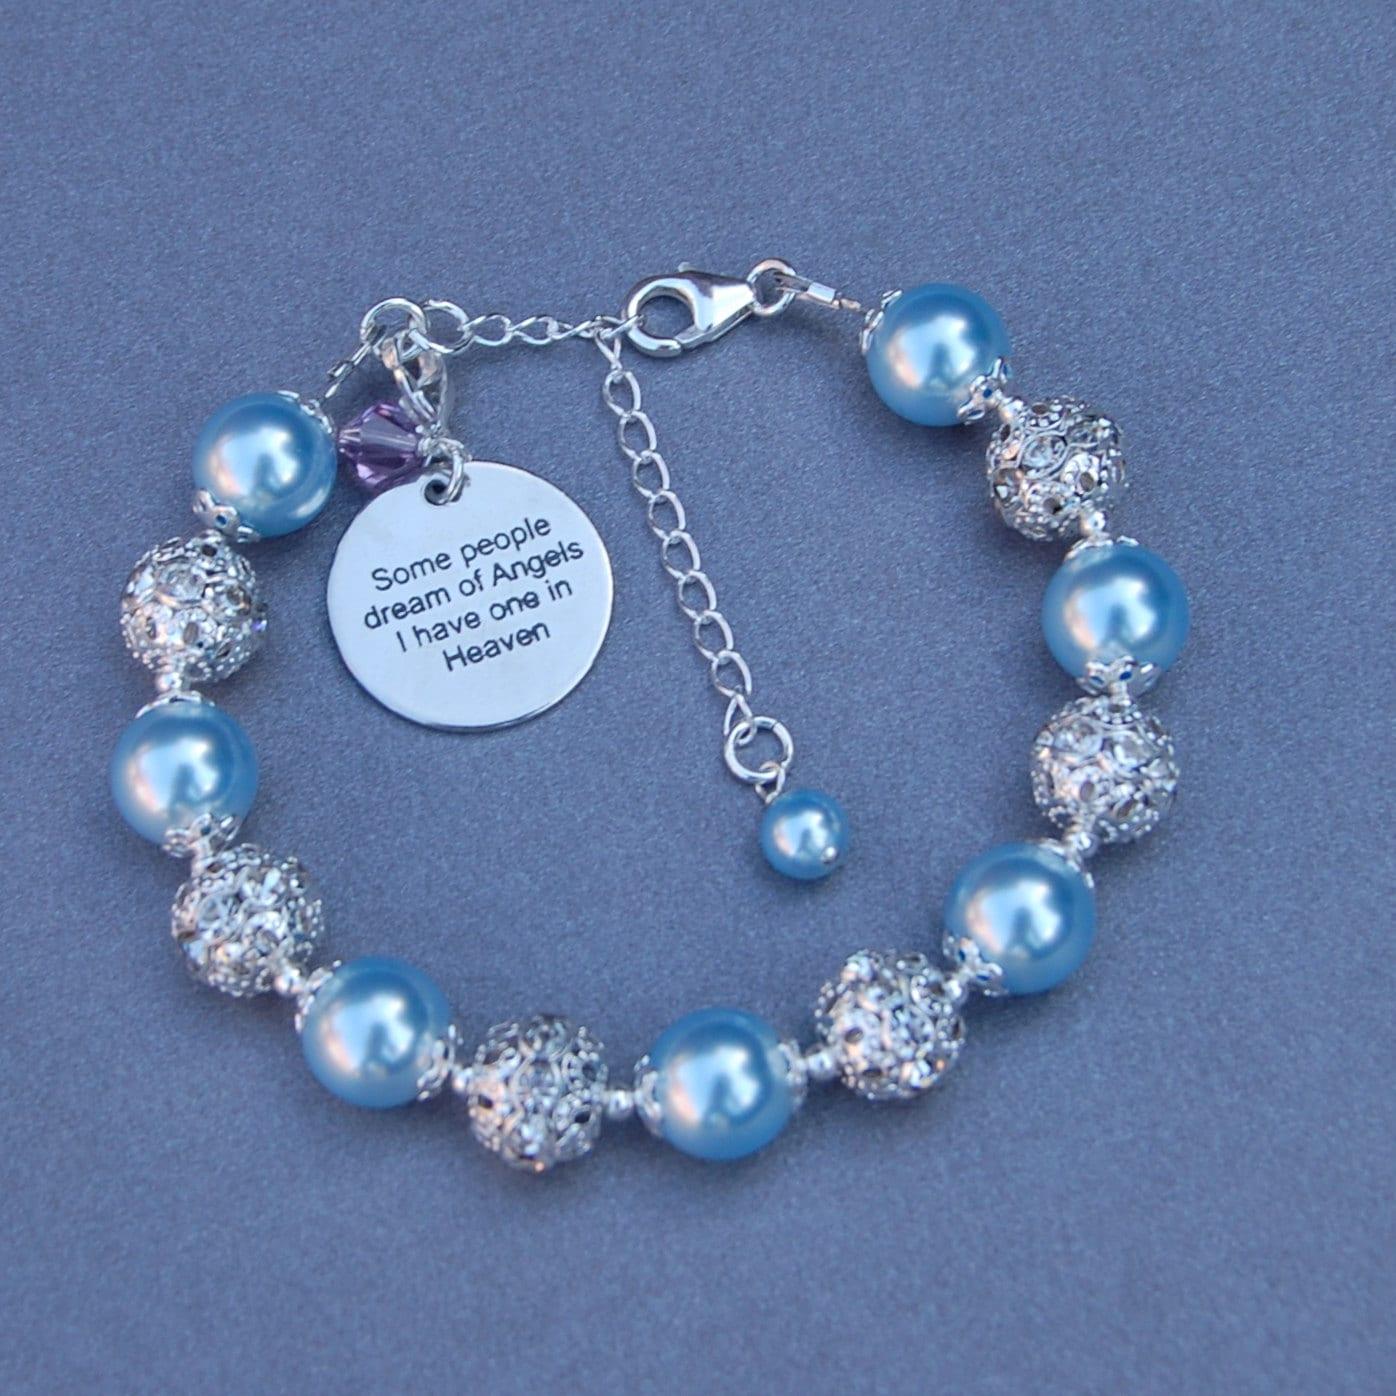 Memory Charm Bracelets: Someone In Heaven Gift In Memory Jewelry Memorial Bracelet